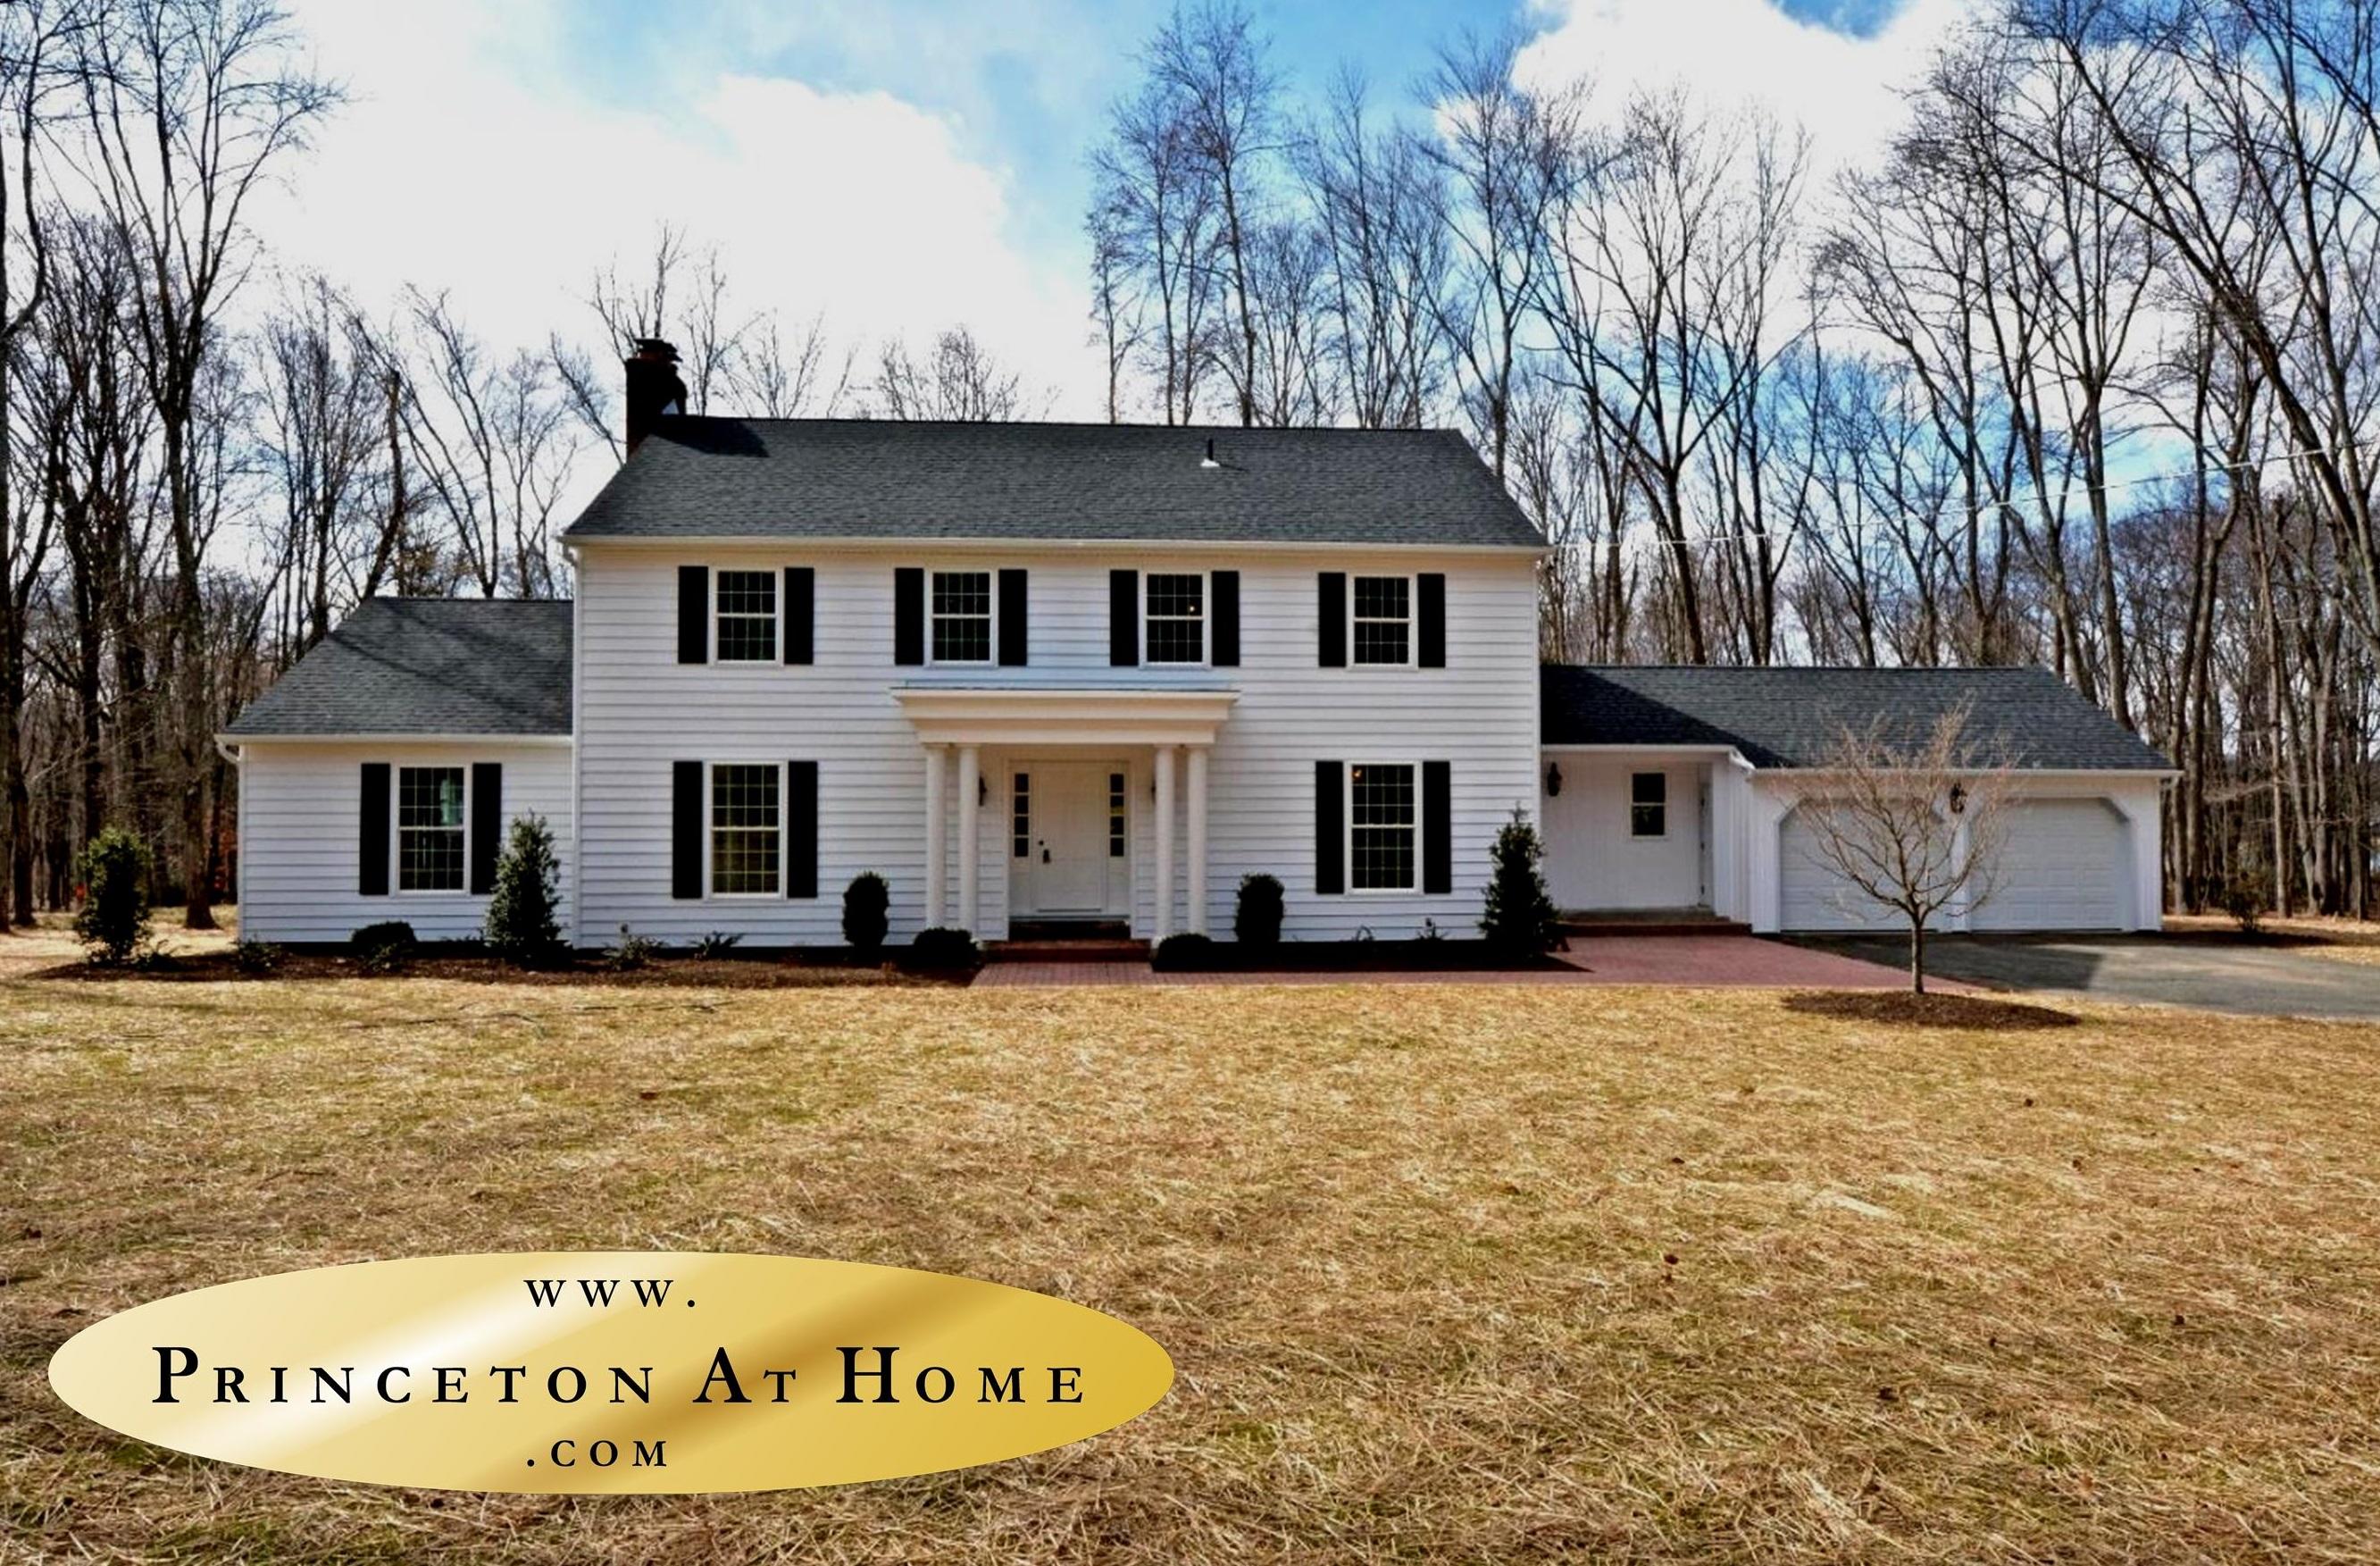 Princeton At Home | www.PrincetonAtHome.com | Steve Walny